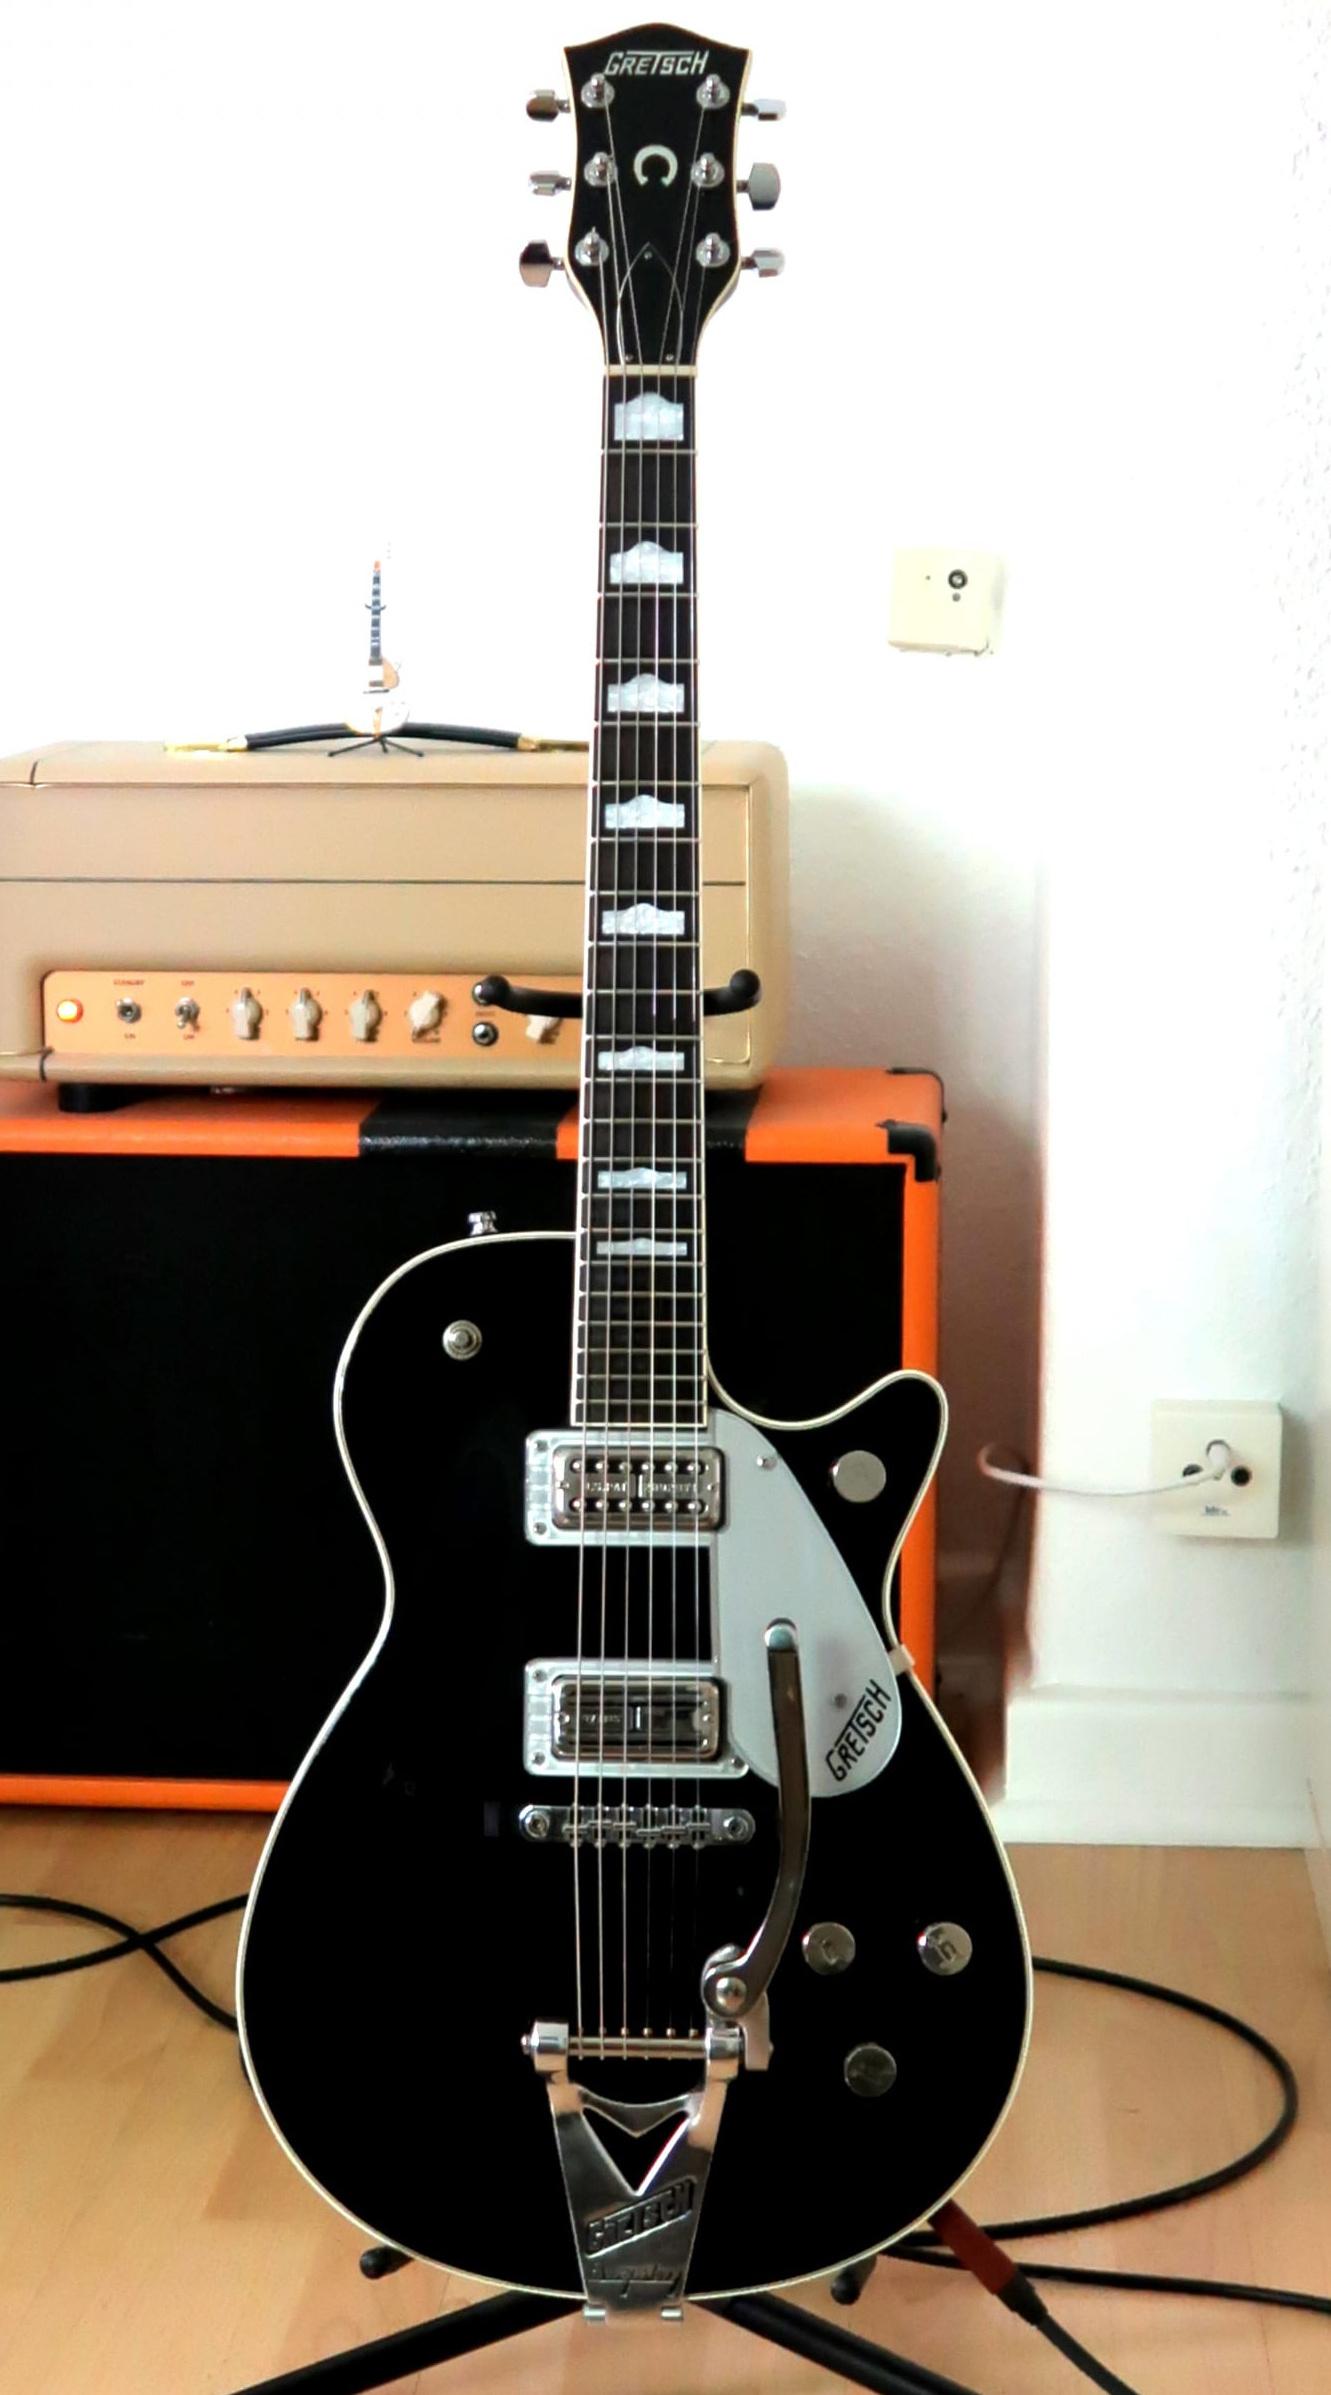 Gretsch 6128T Electric guitar Amp